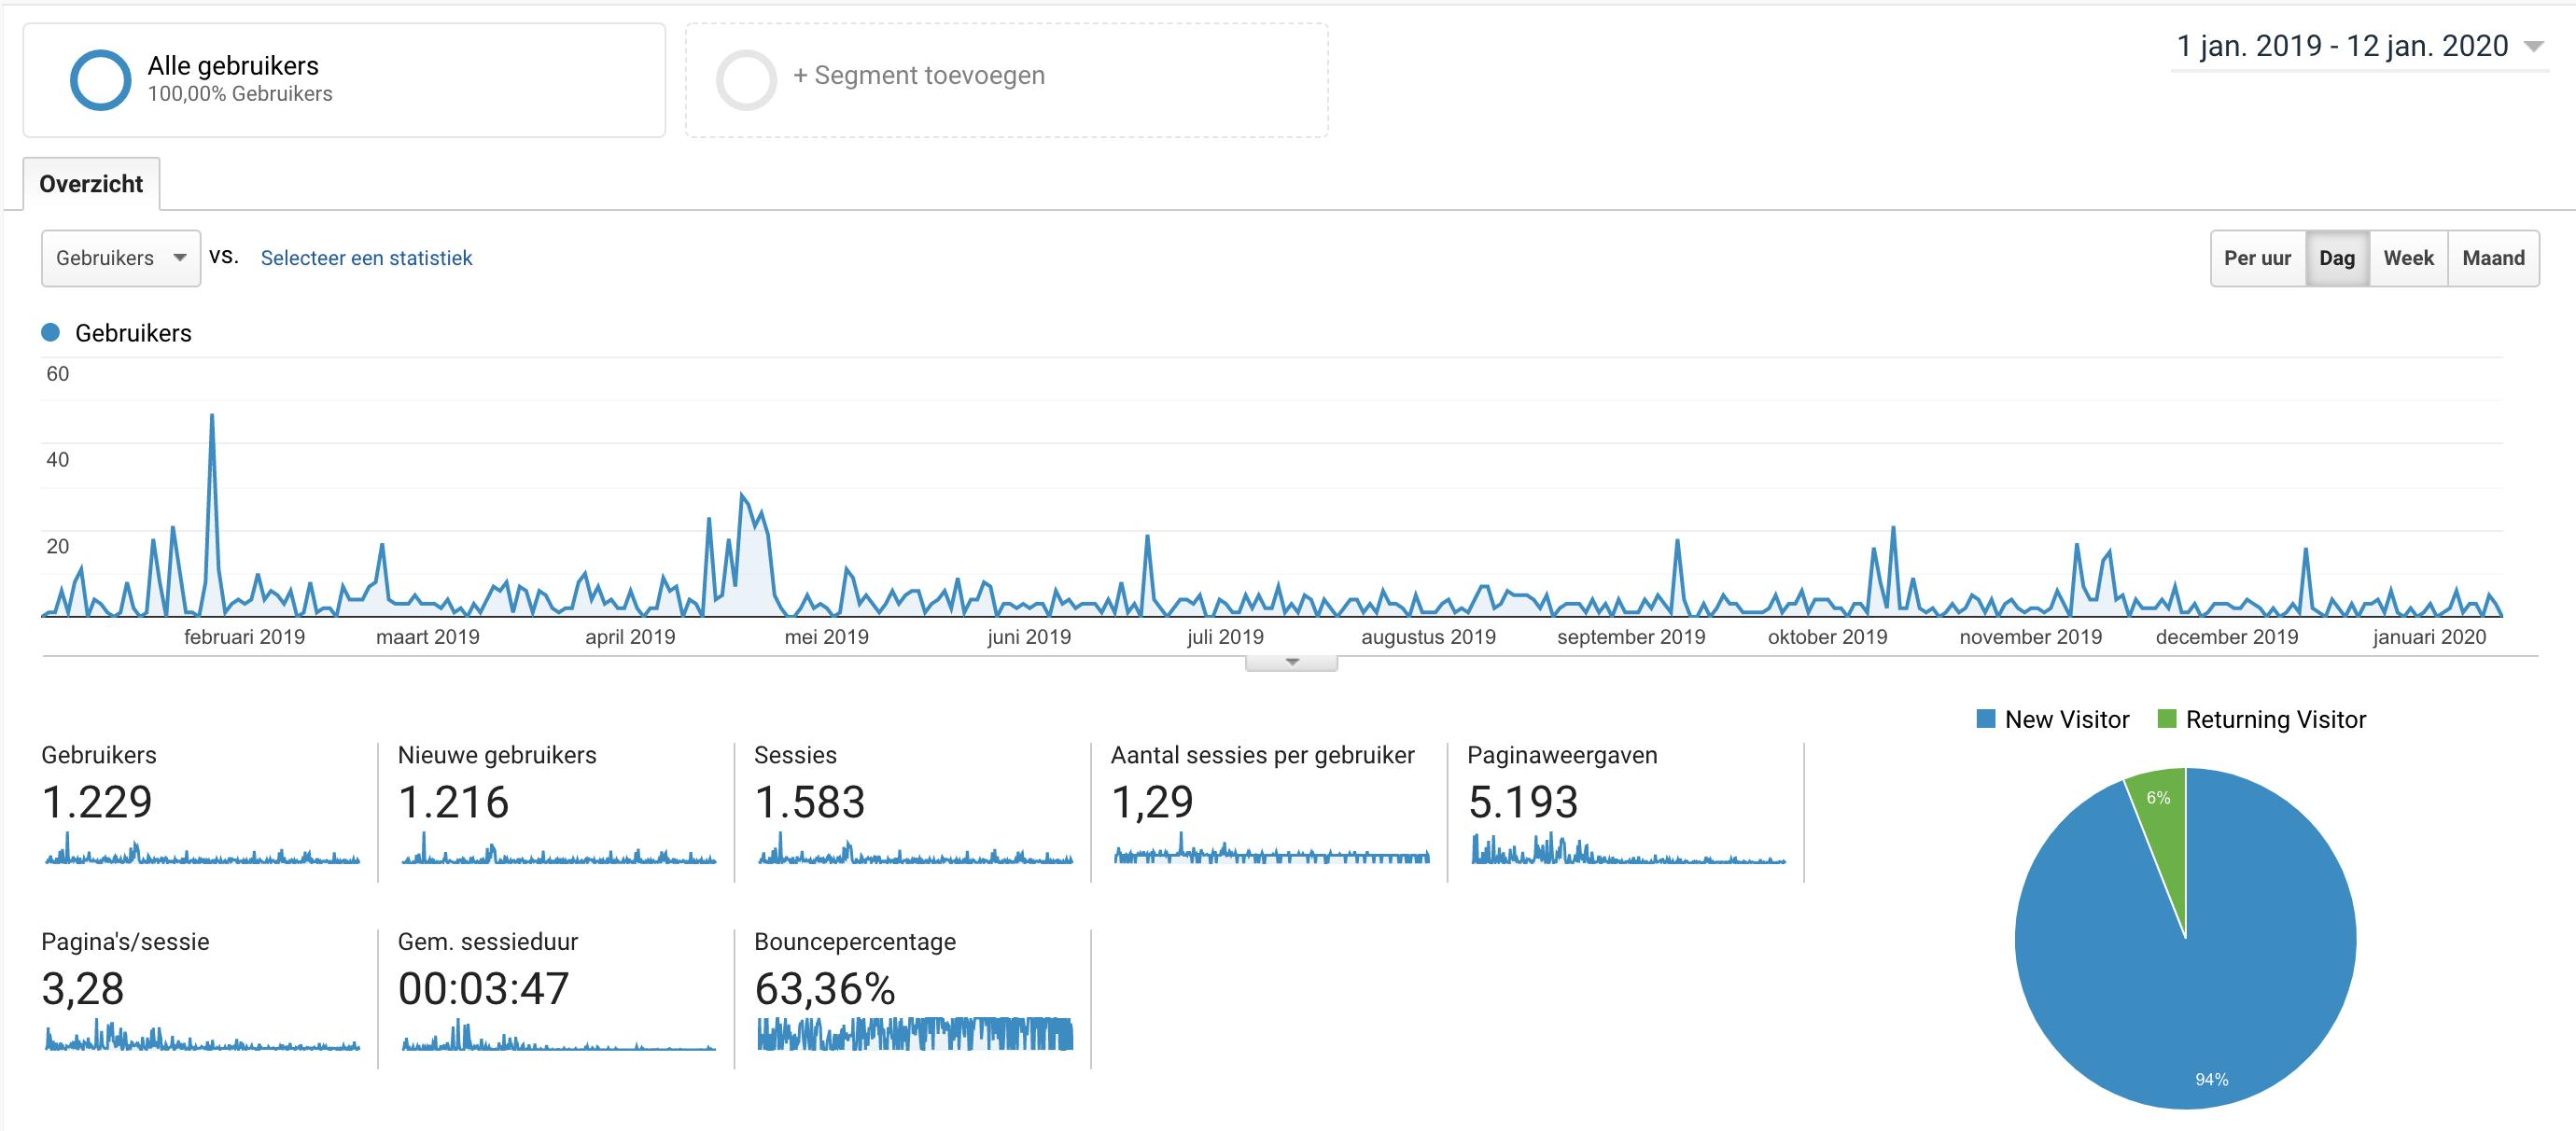 Kant en klare sneaker affiliate shops | 100 bezoekers p/m | EMD's met ENORME potentie-screenshot-2020-01-at-png